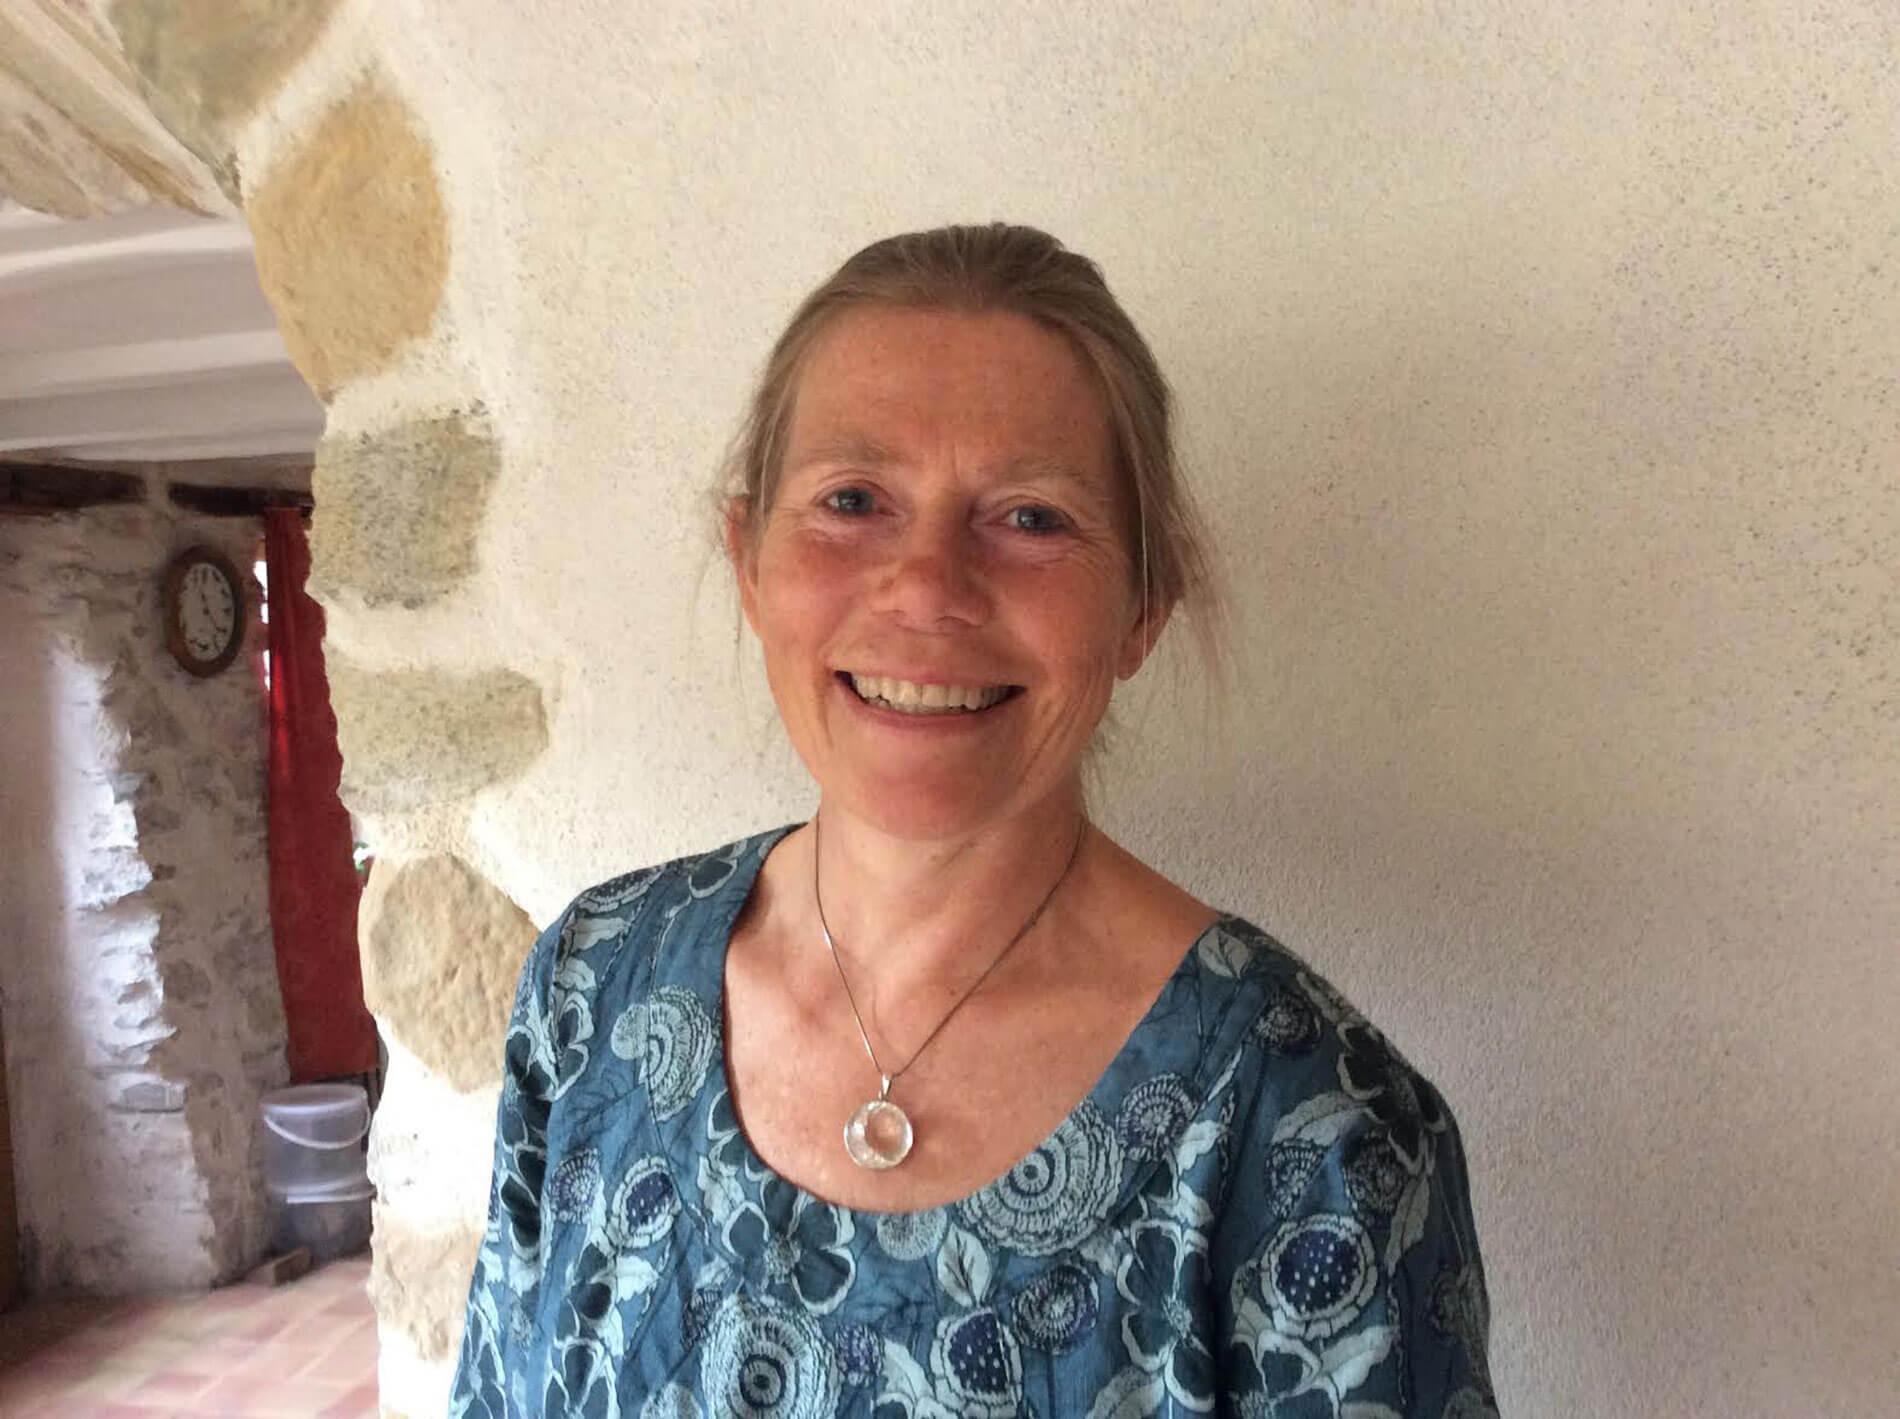 Portait de Nochenka Welsh psychopraticienne à Montbrun-Bocage